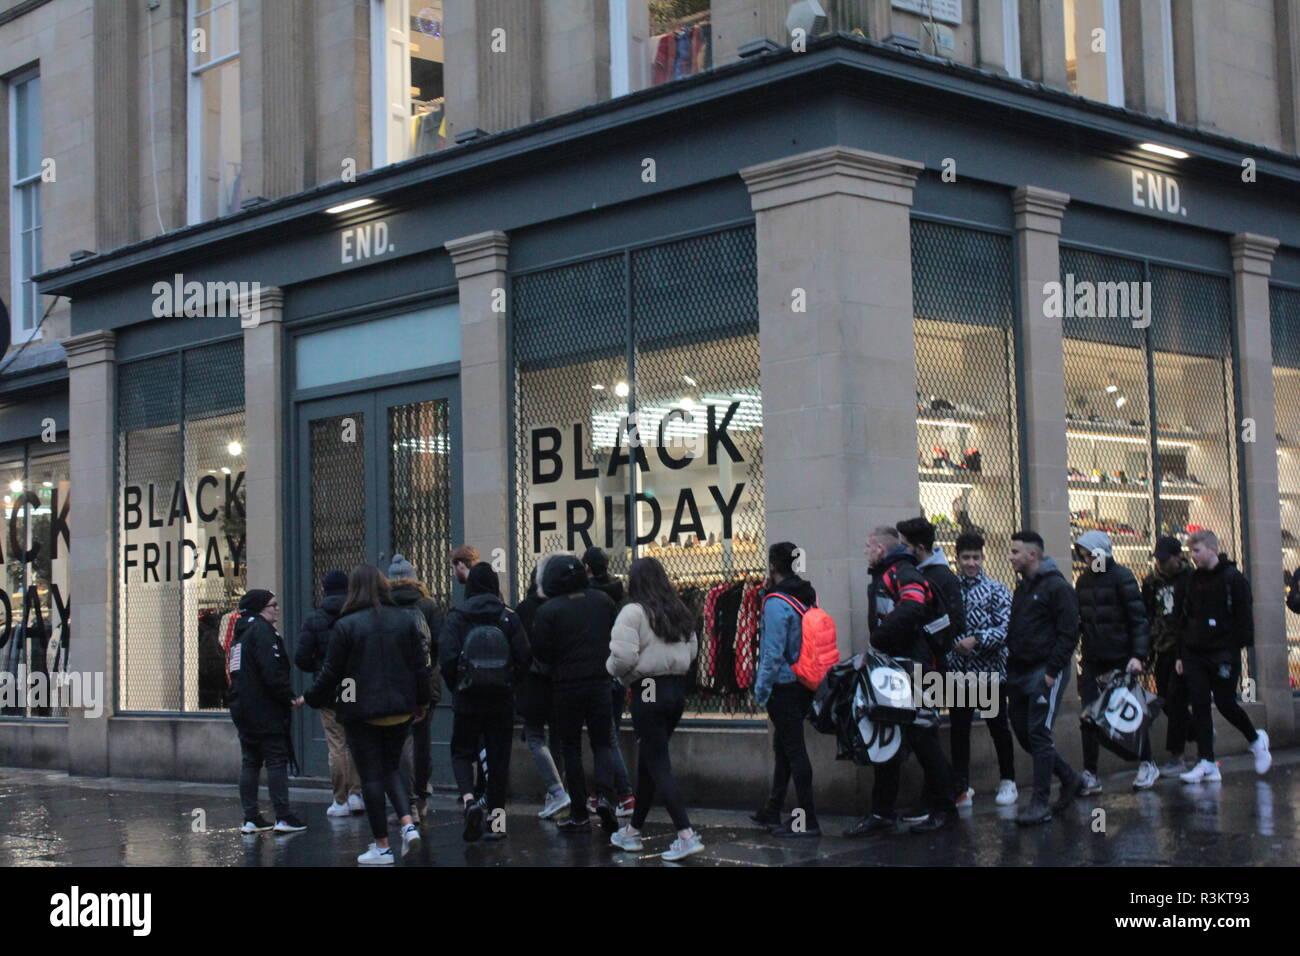 newcastle uk 23rd nov 2018 black friday shoppers queuing